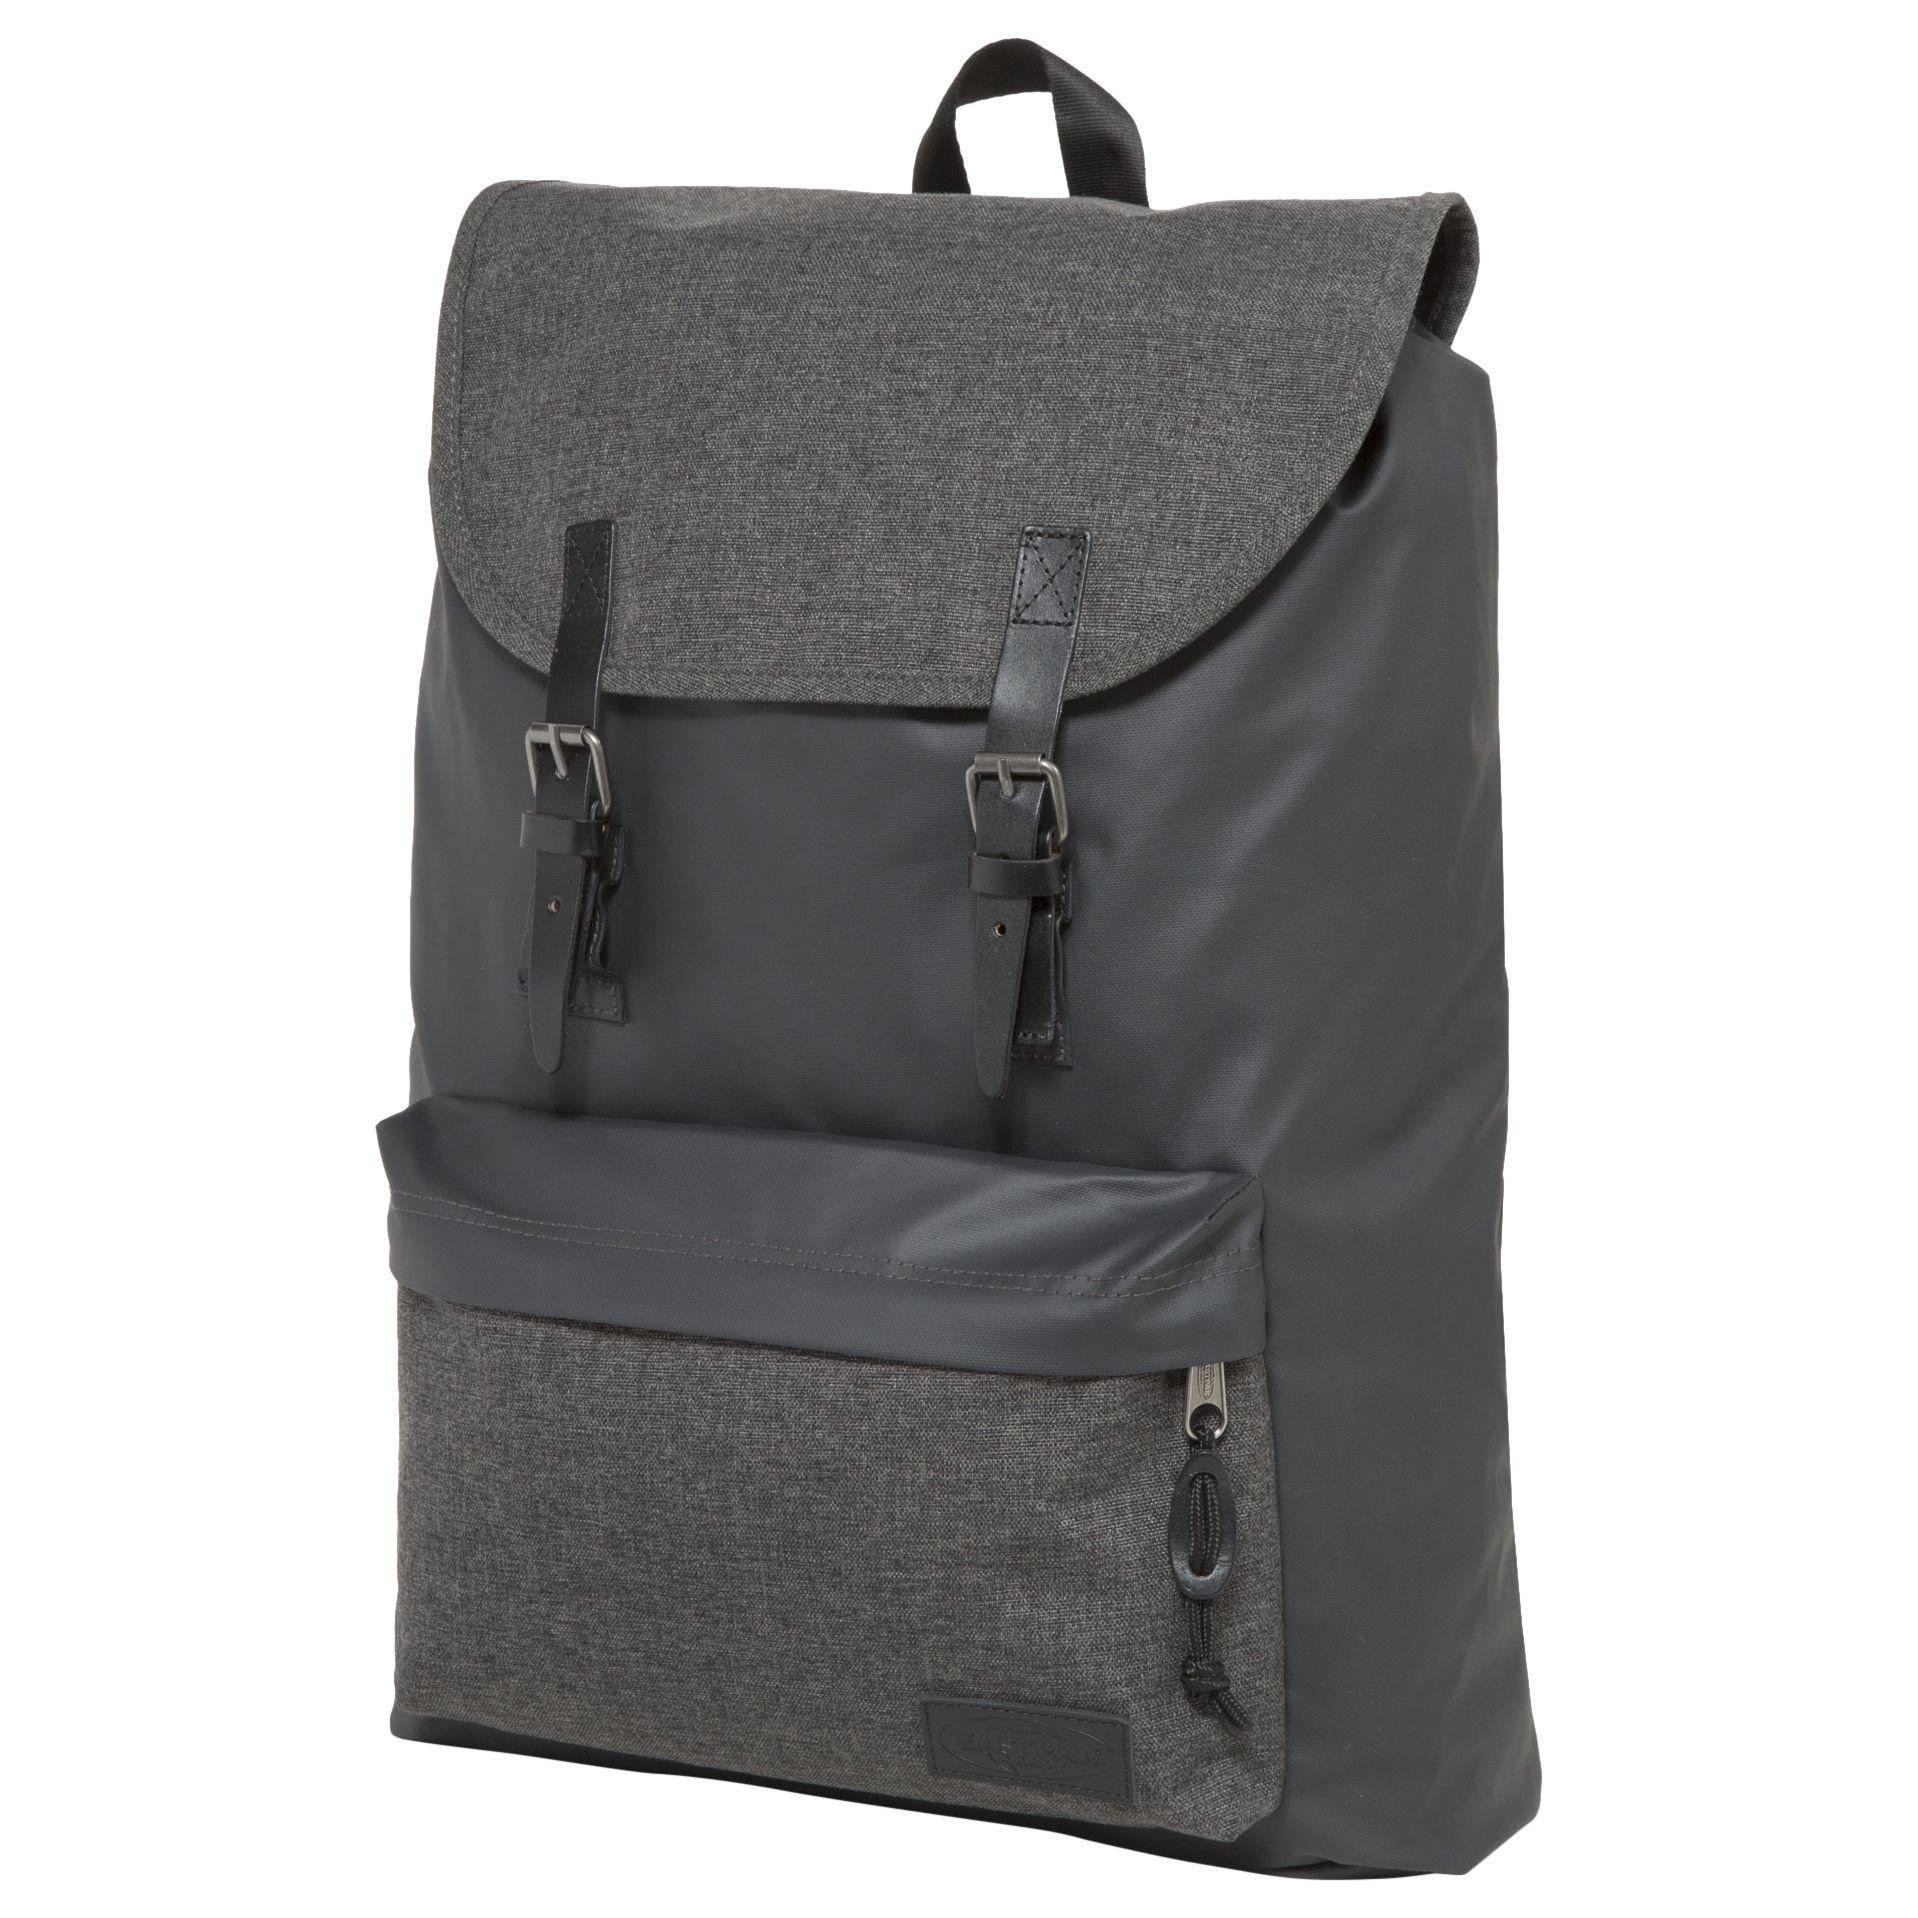 Eastpak Leather London Laptop Backpack